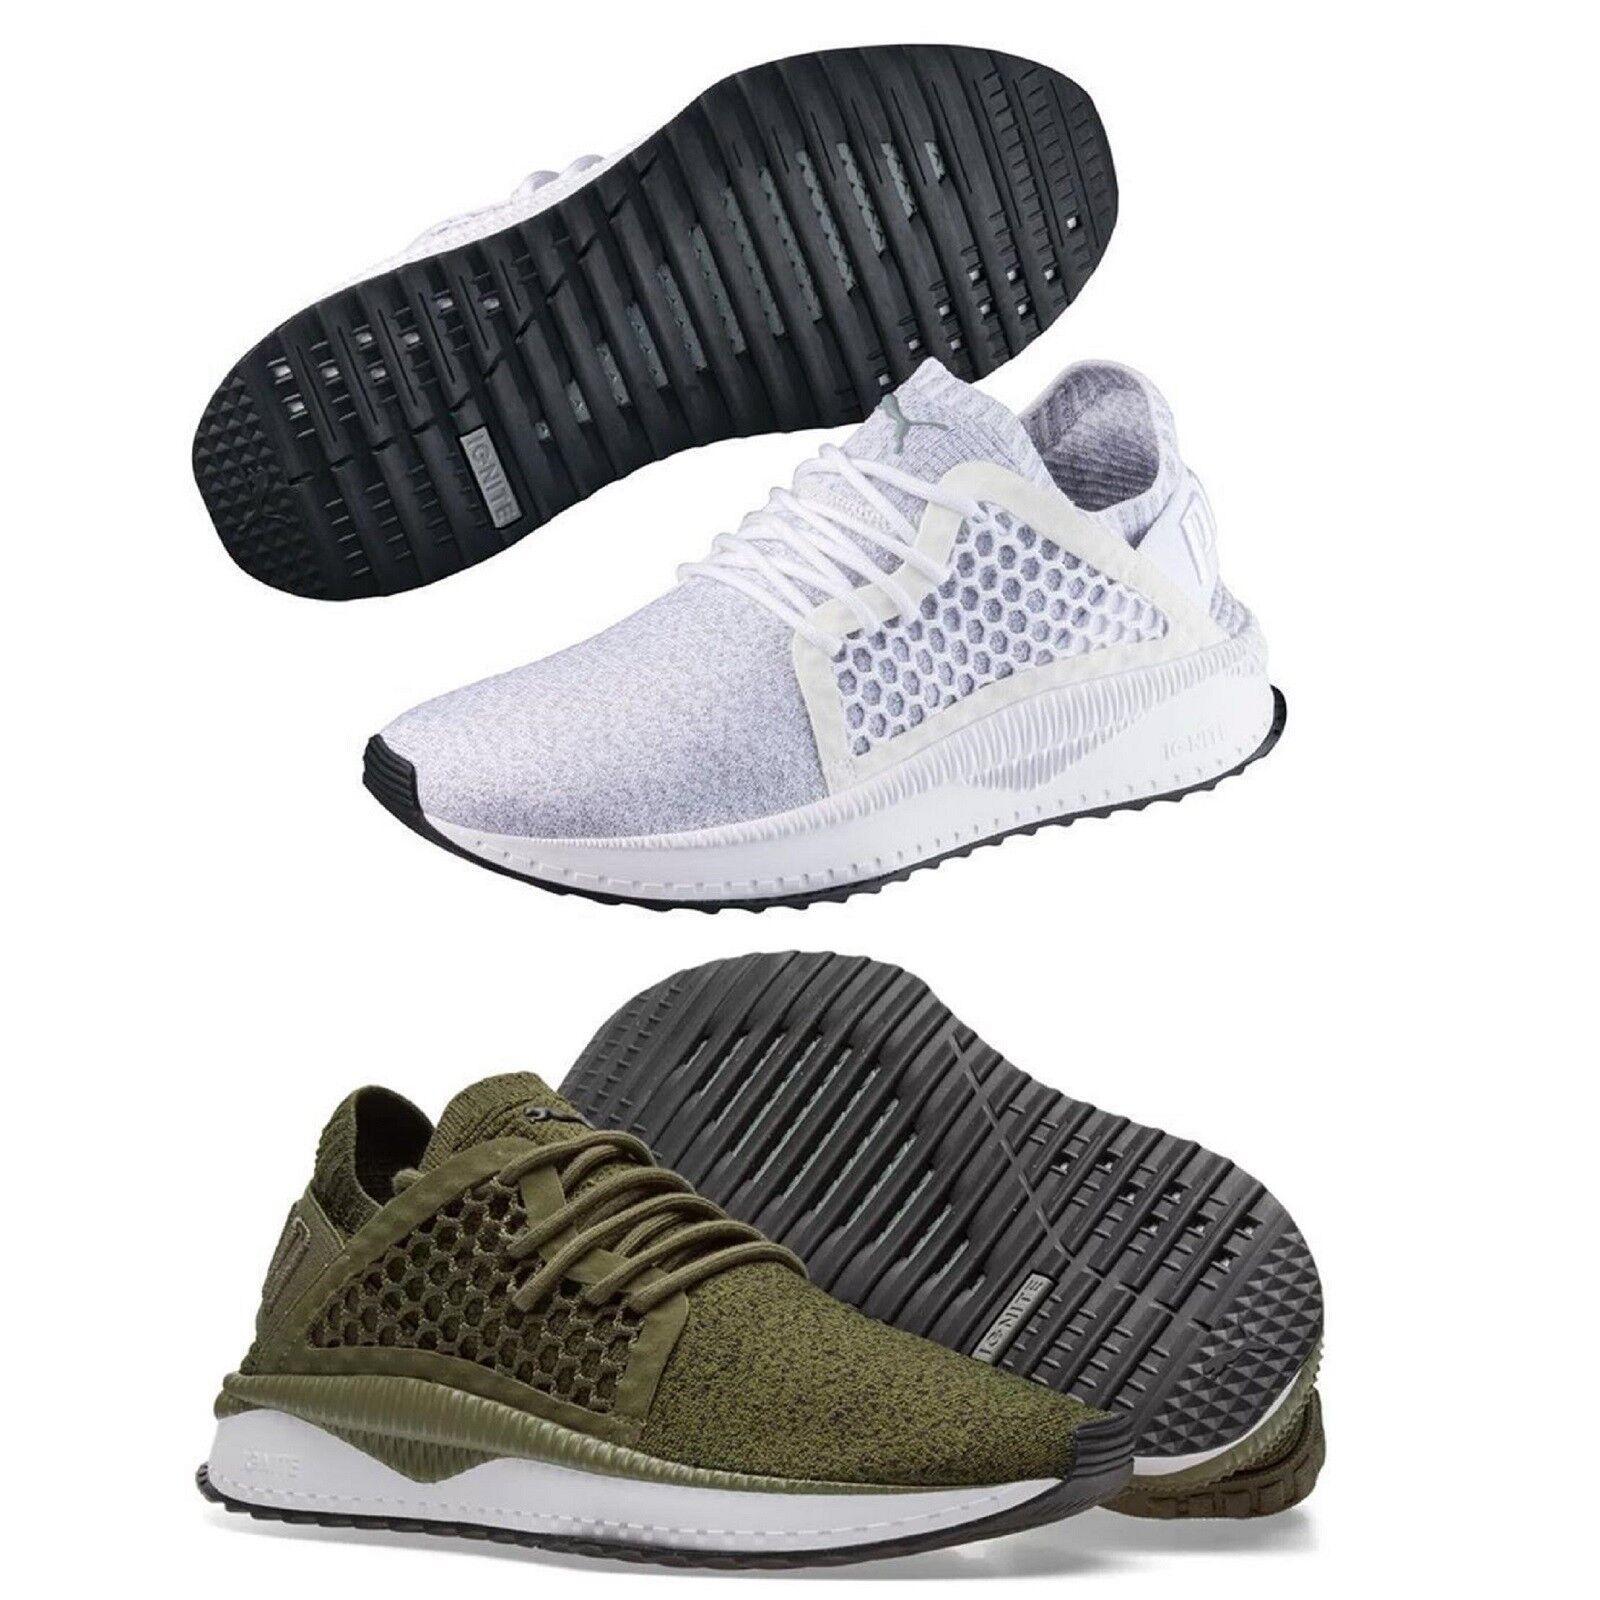 premium selection b1c79 a8c45 Puma TSUGI Netfit Evoknit Mens Trainers Shinshei Cage Olive White Shoes